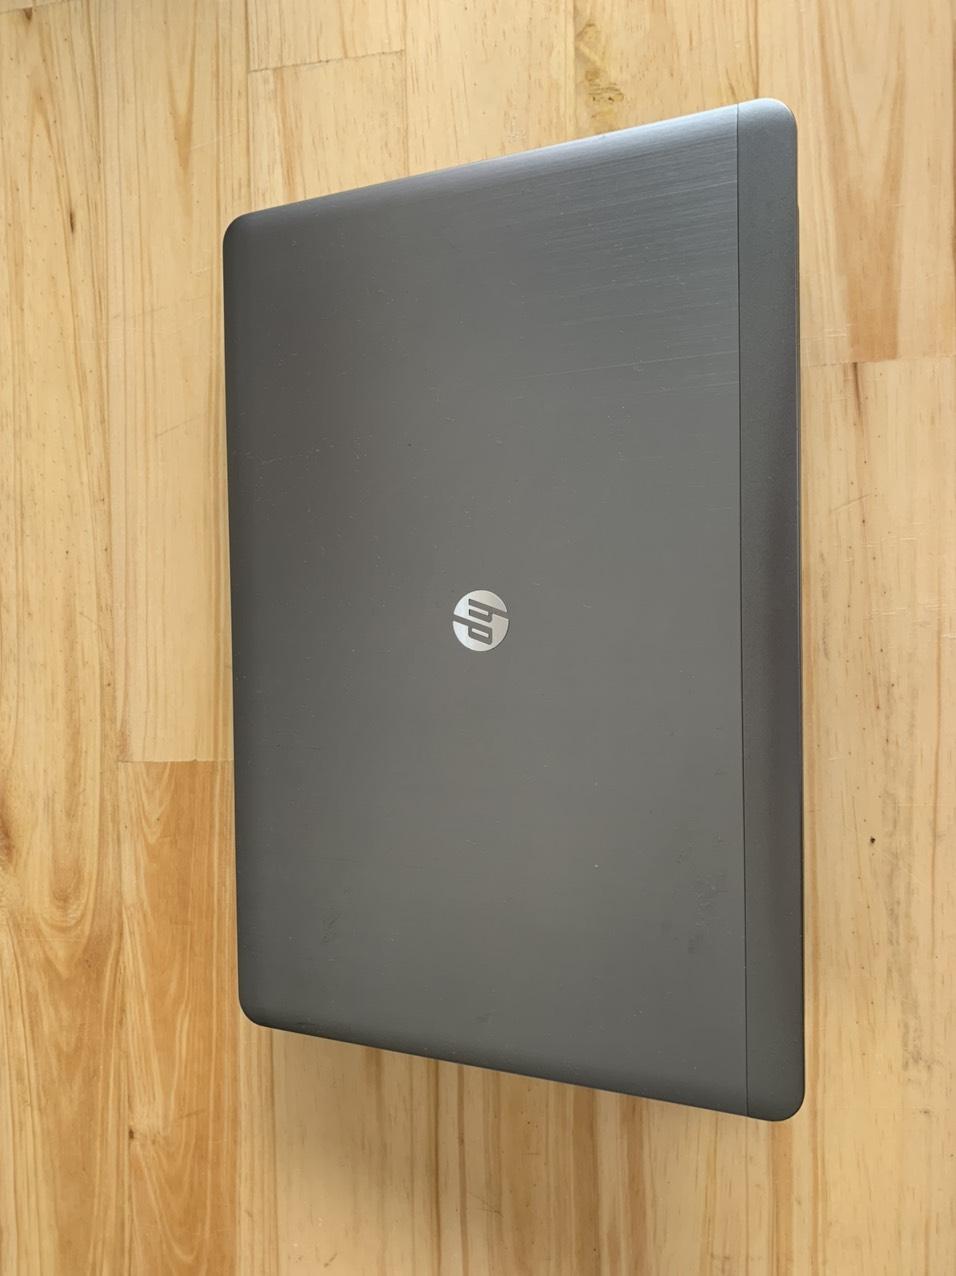 Laptop HP Probook 4441s (Core i5-3230M, RAM 4GB, HDD 320GB, 2GB AMD Radeon HD 7650M, 14 inch)